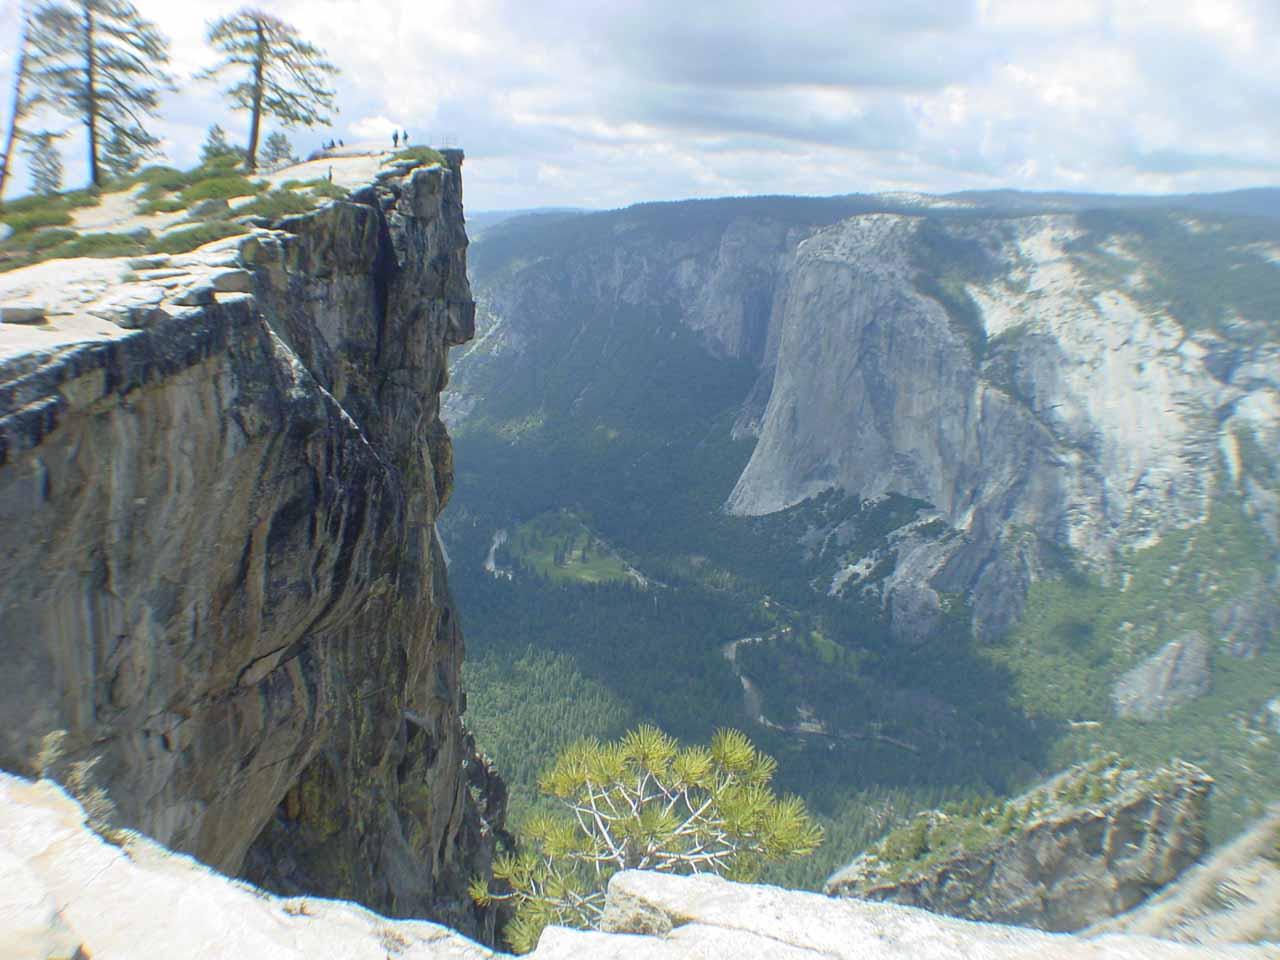 The vertical cliffs of Taft Point